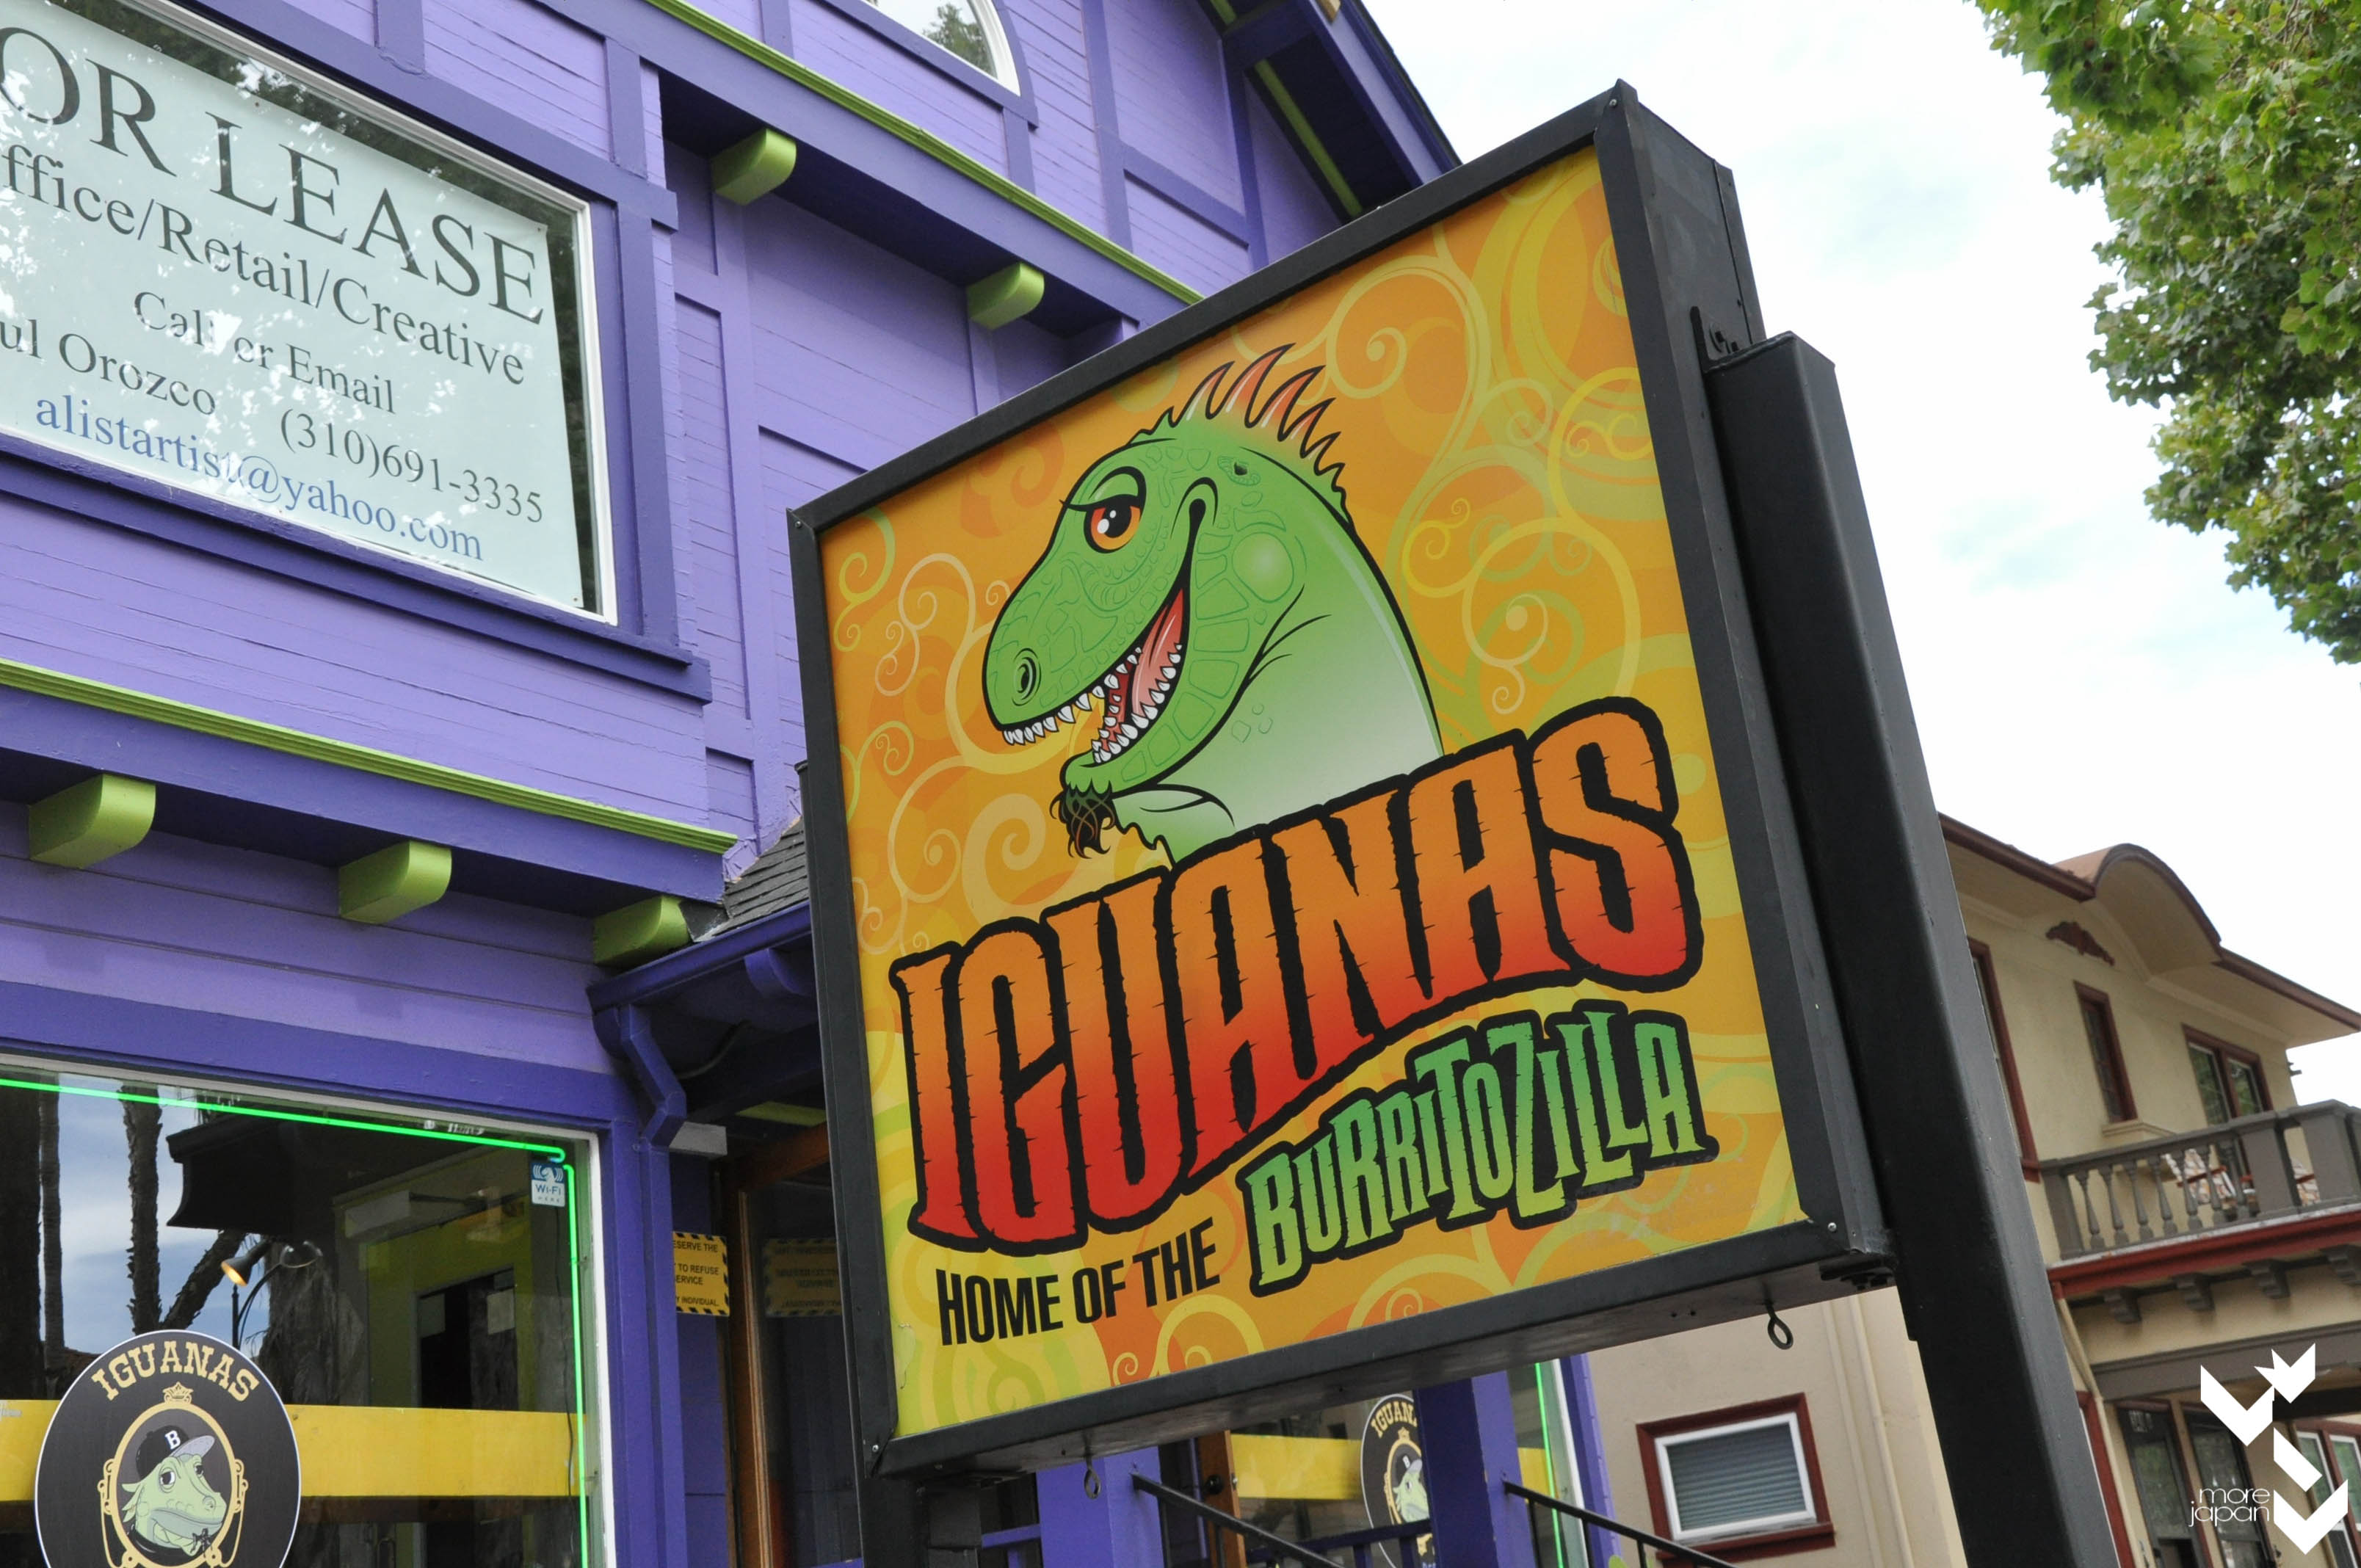 Heard they had giant burritos....